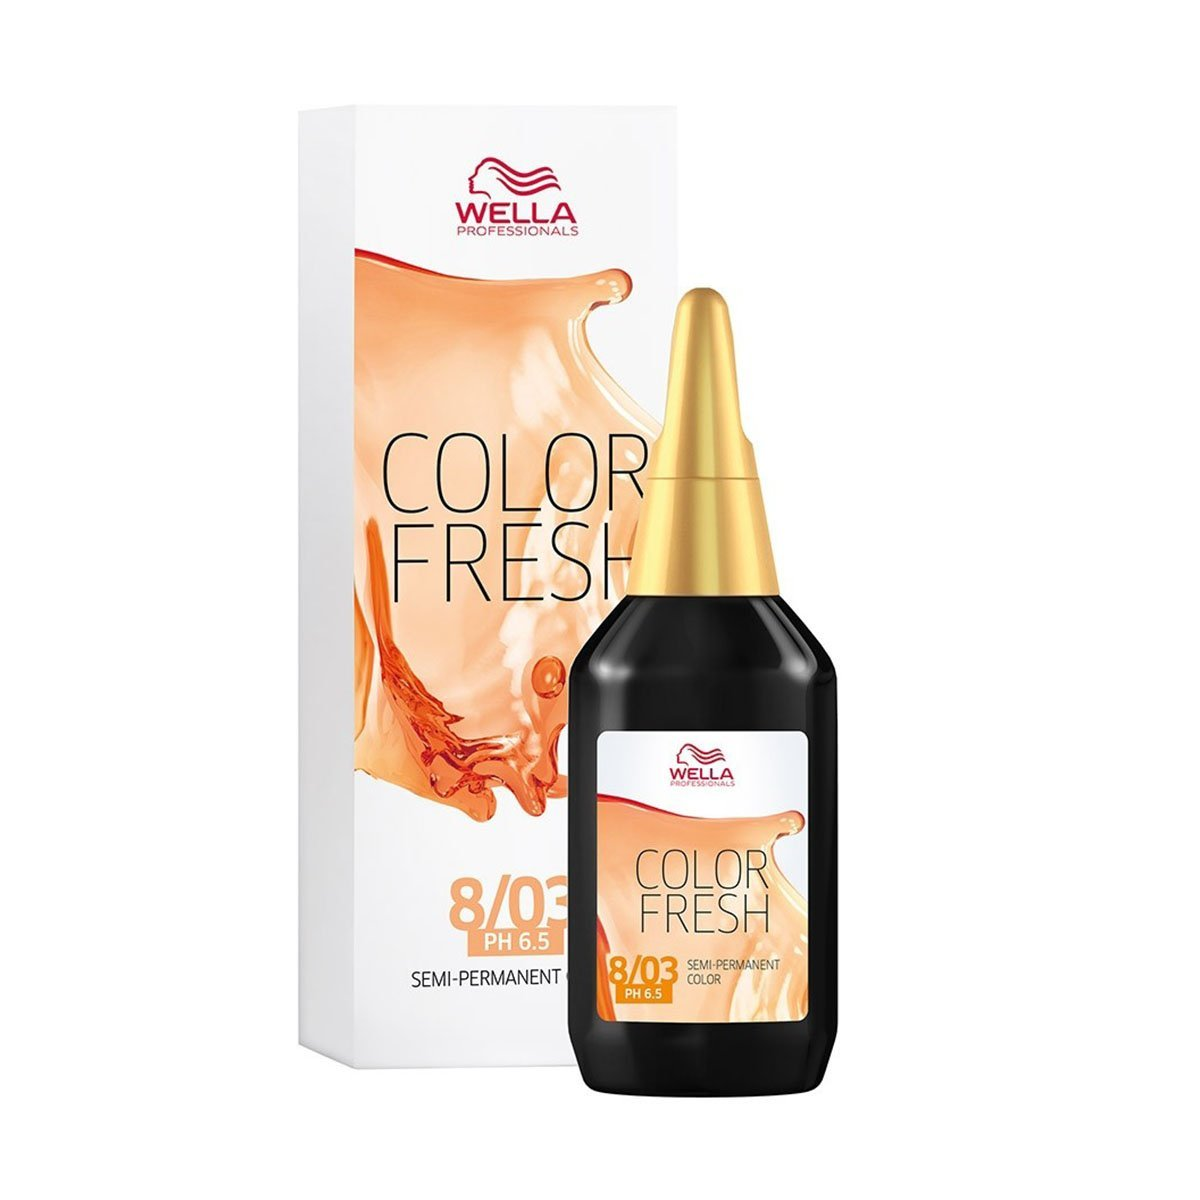 Wella Light Blonde Natural Gold 8/03